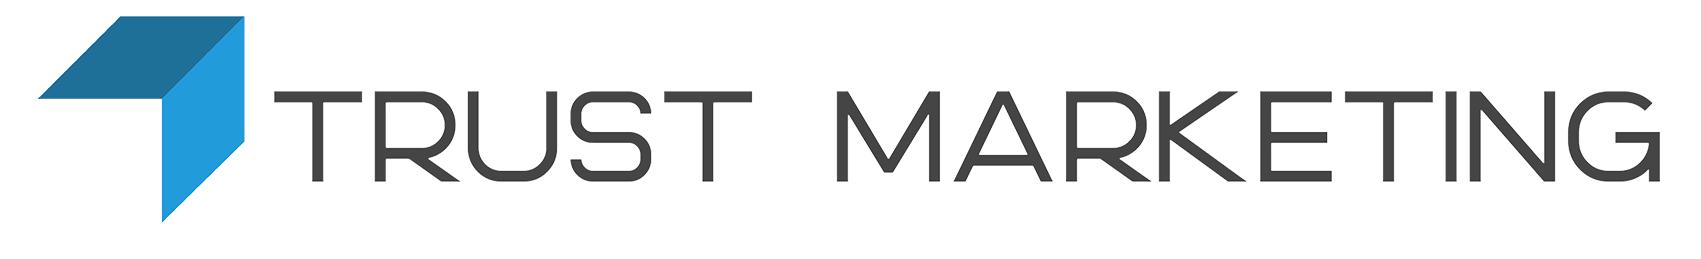 TRUST MARKETING ロゴ